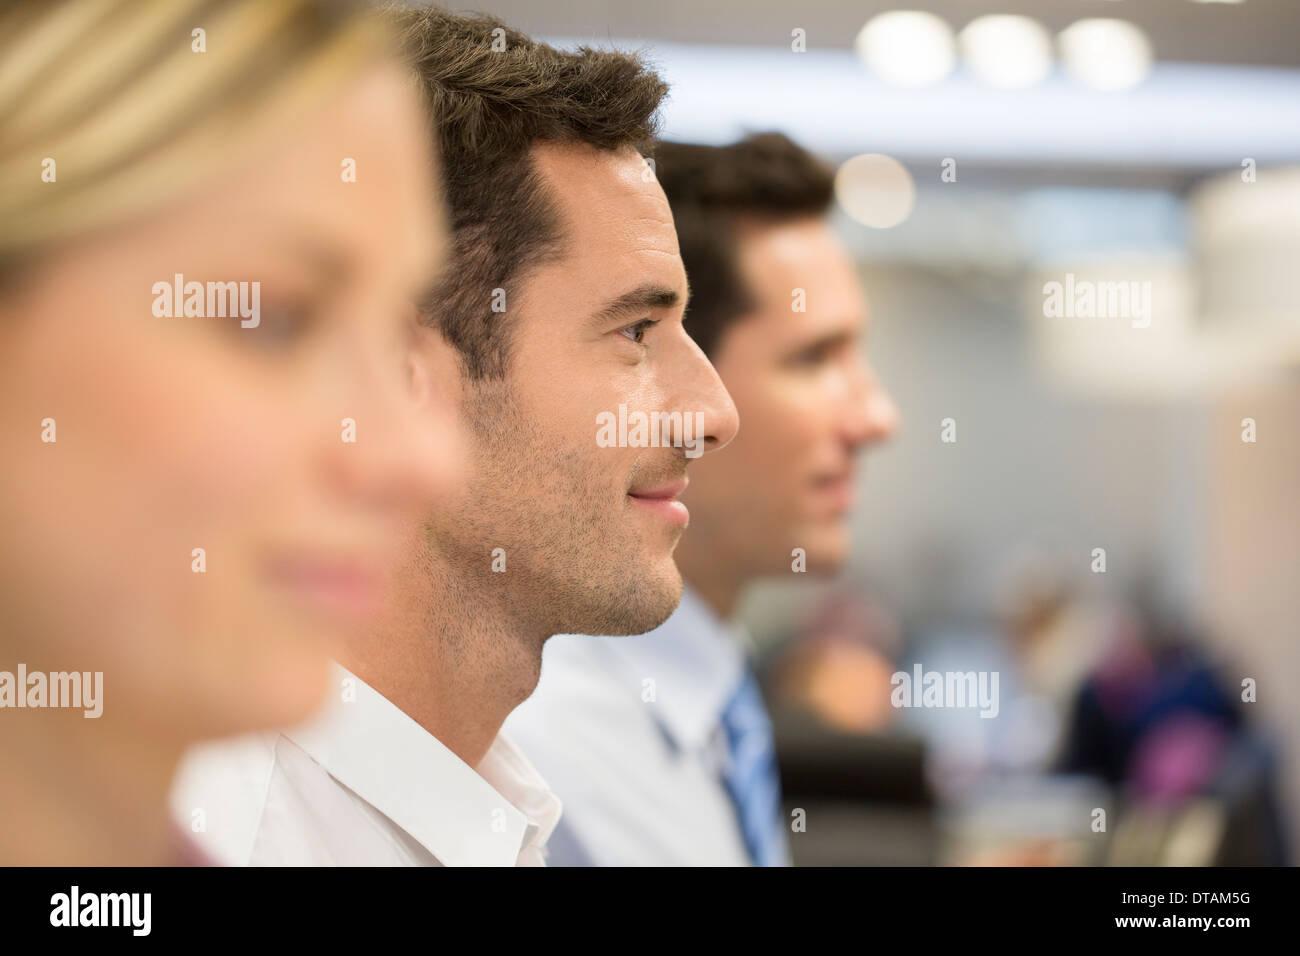 La oficina del grupo de hombres mujer línea de perfil Imagen De Stock